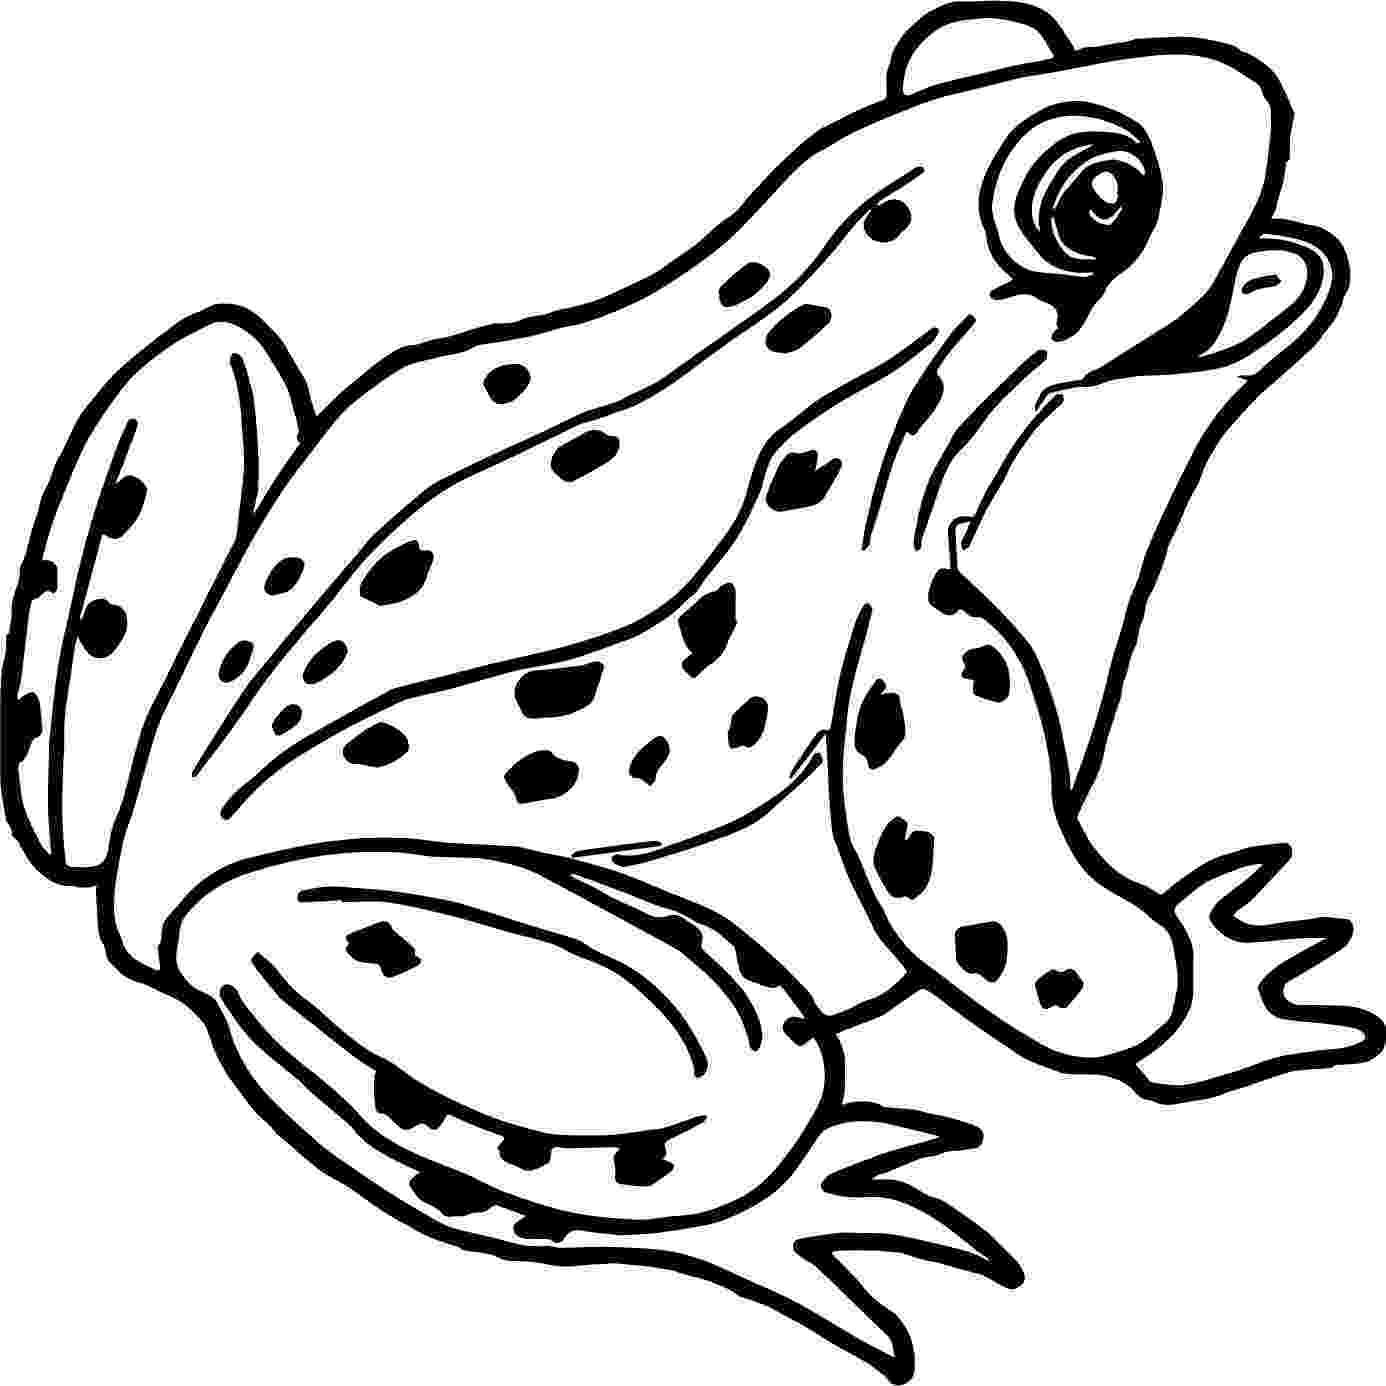 amphibian coloring pages salamander amphibian coloring page wecoloringpagecom pages coloring amphibian